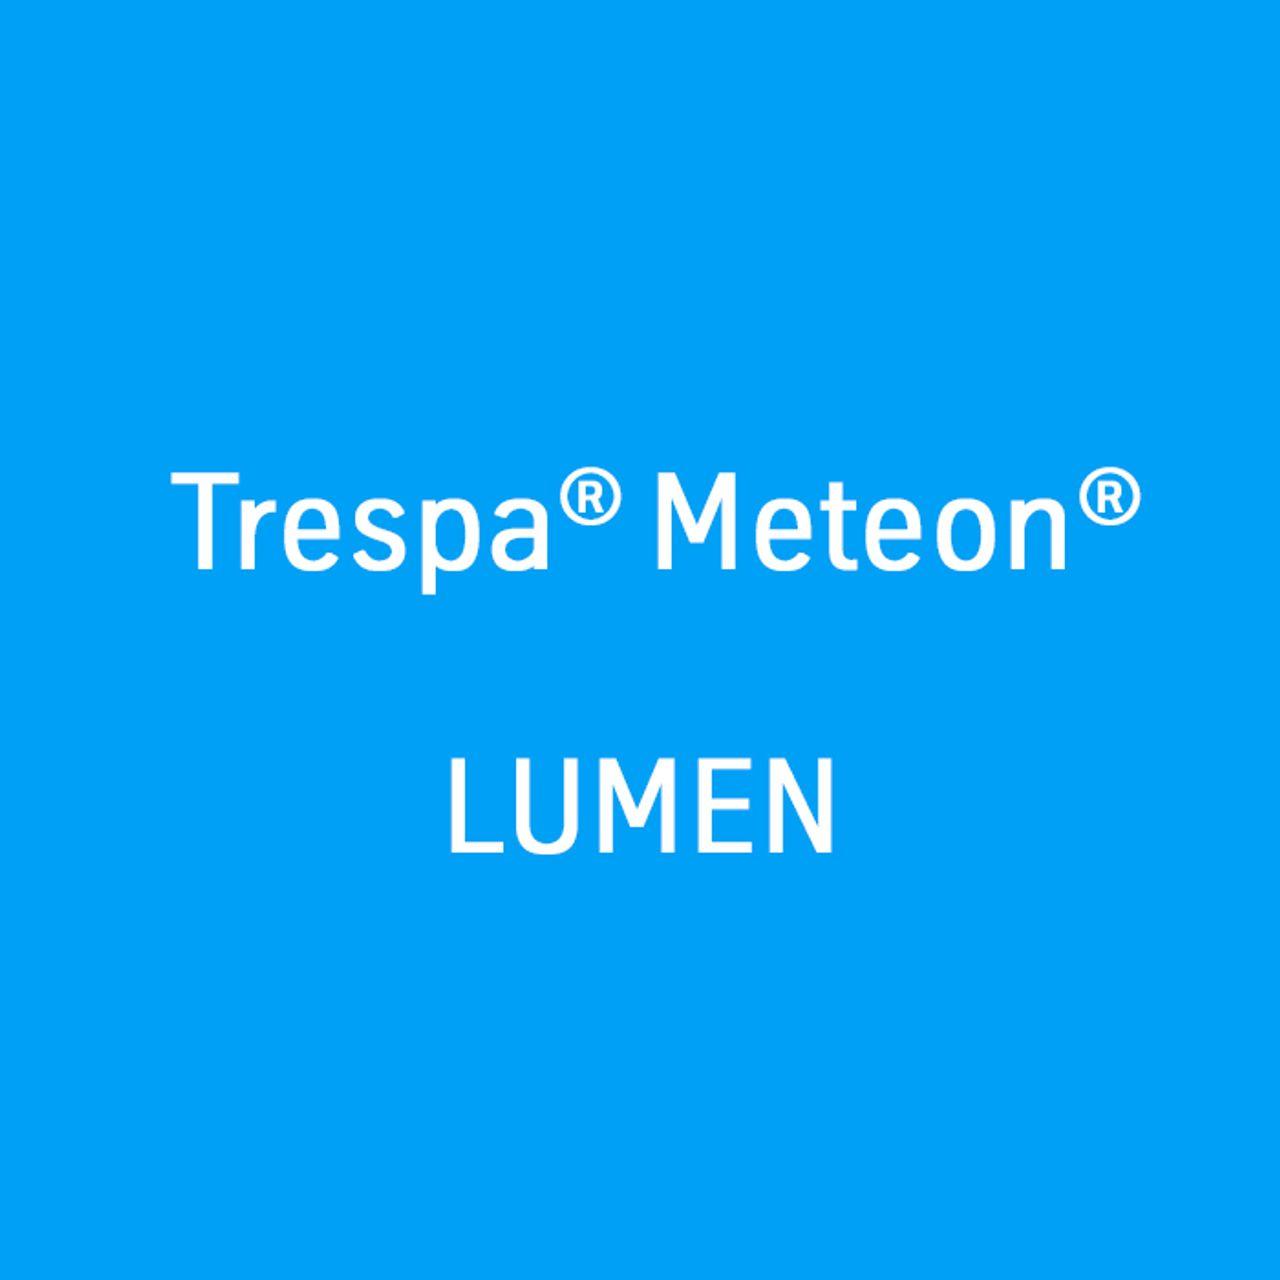 Trespa® Meteon® LUMEN